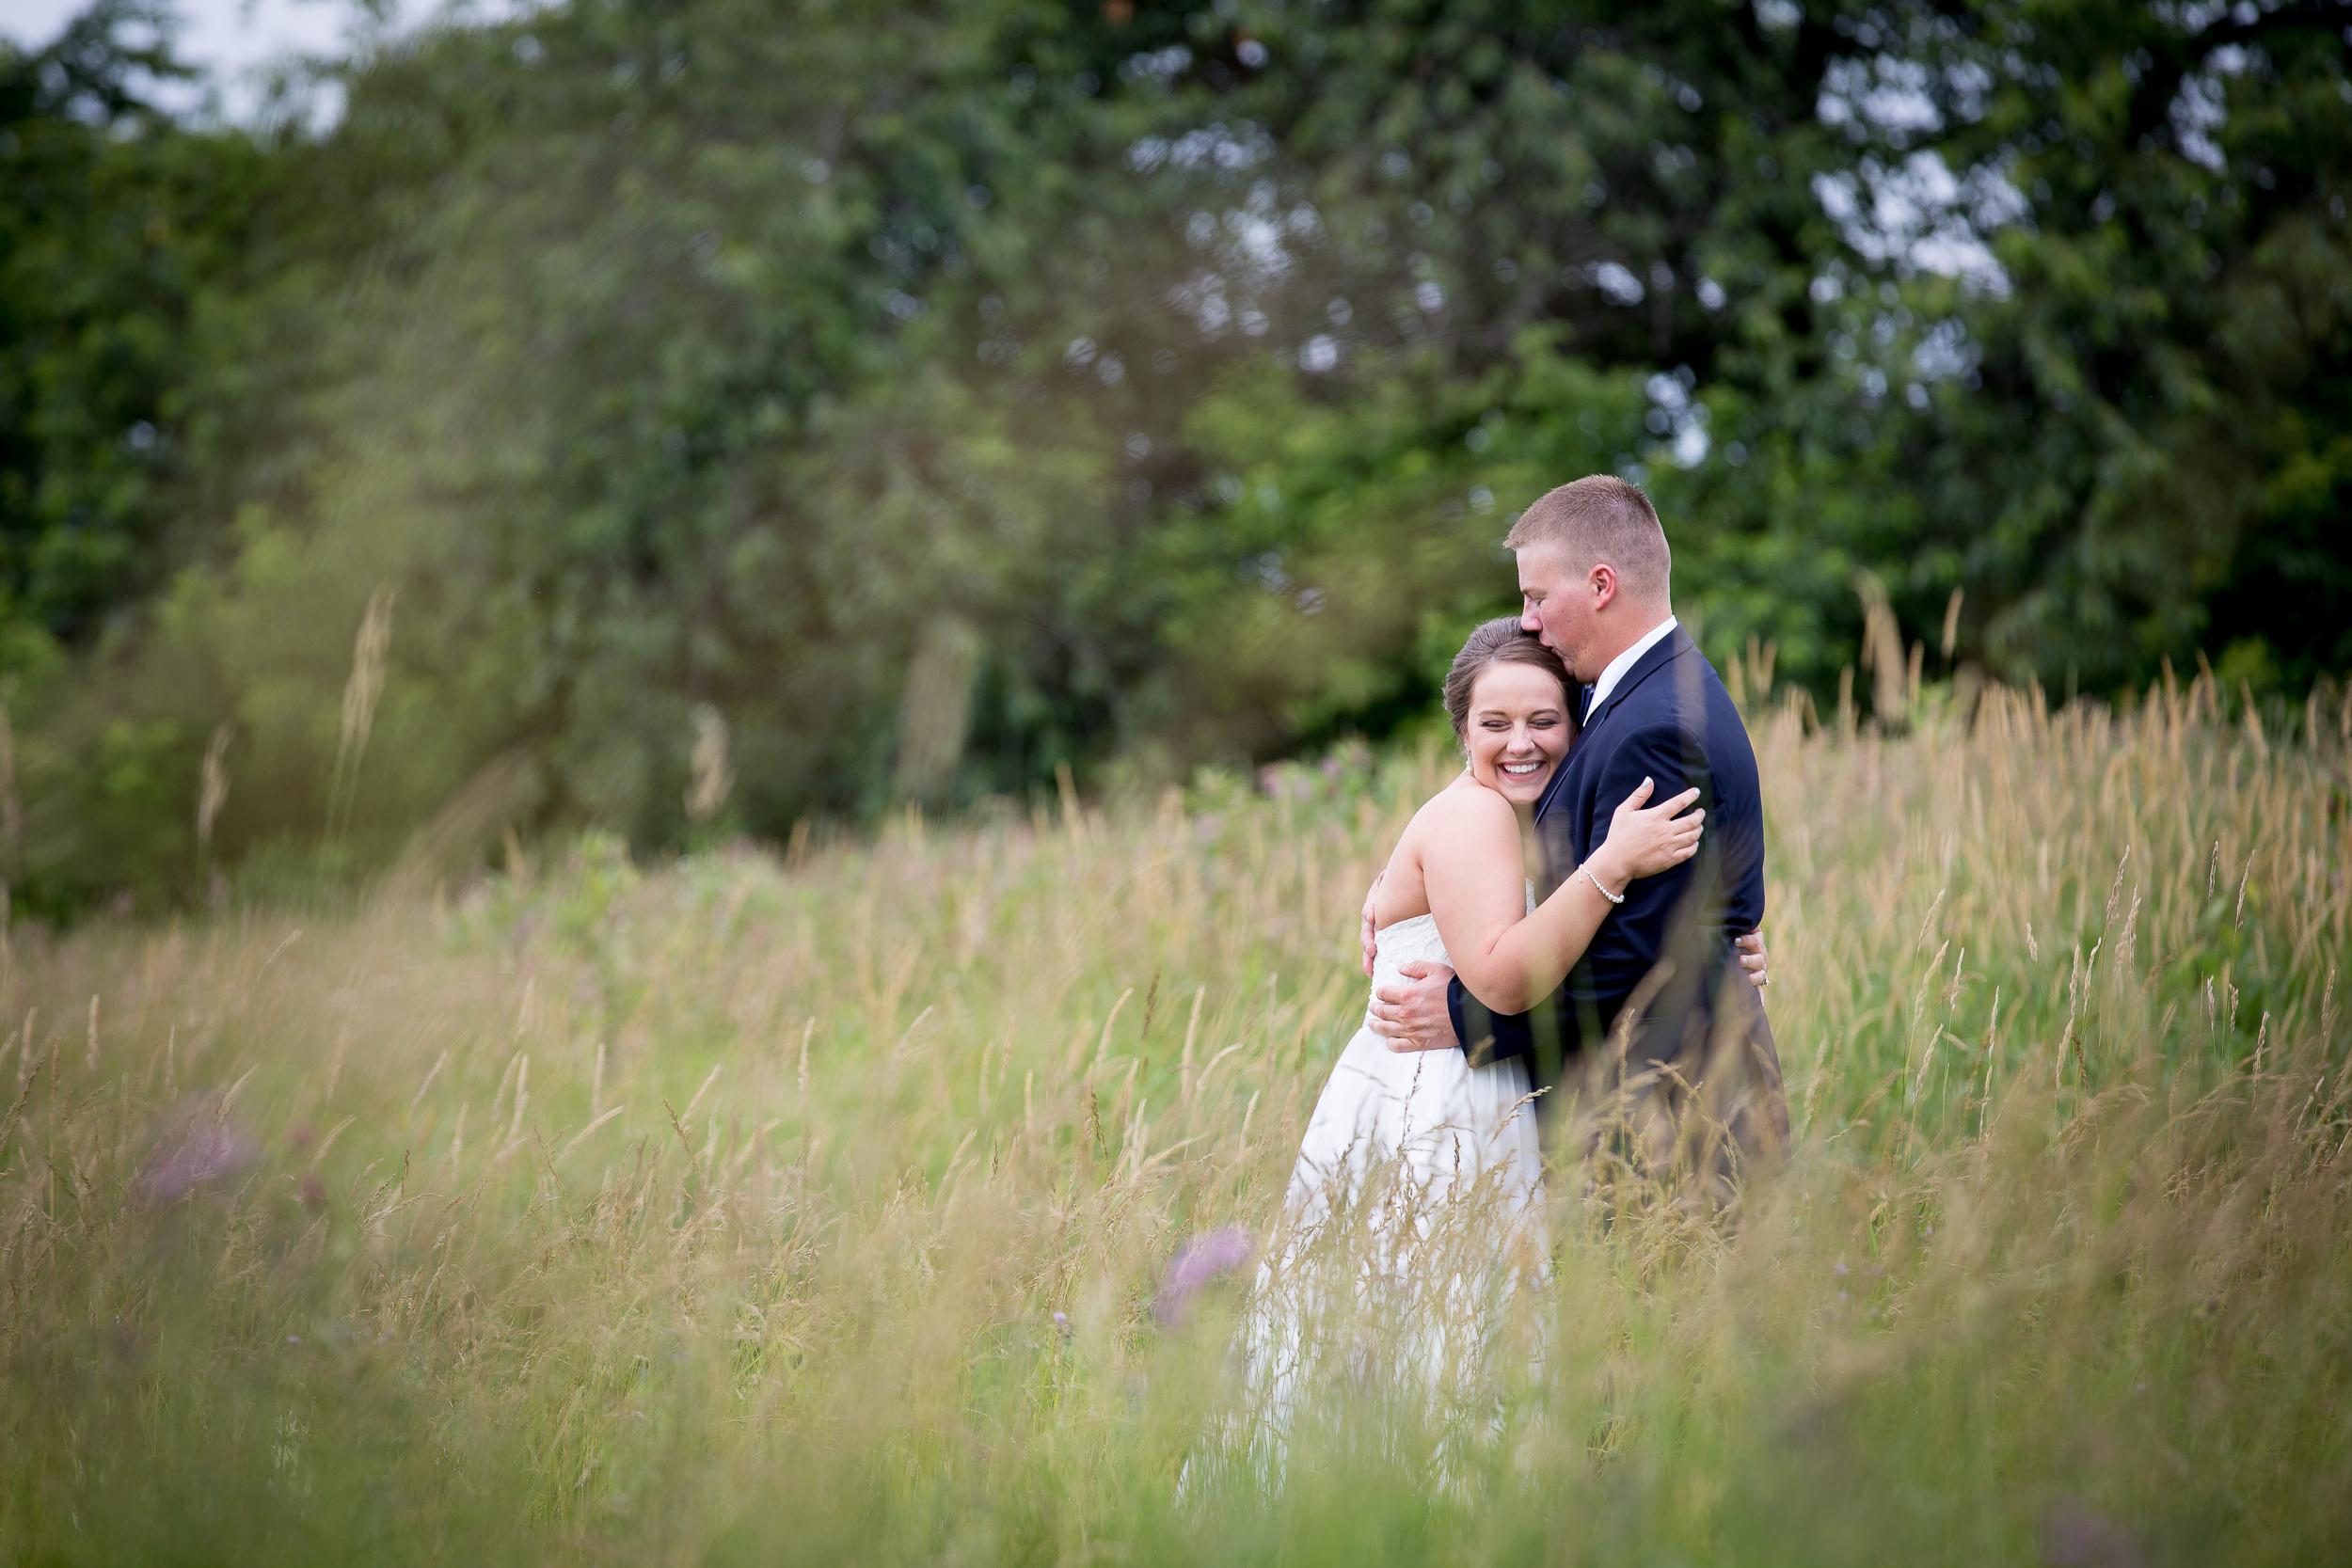 bride groom wildflower field minnesota wedding photographer backyard